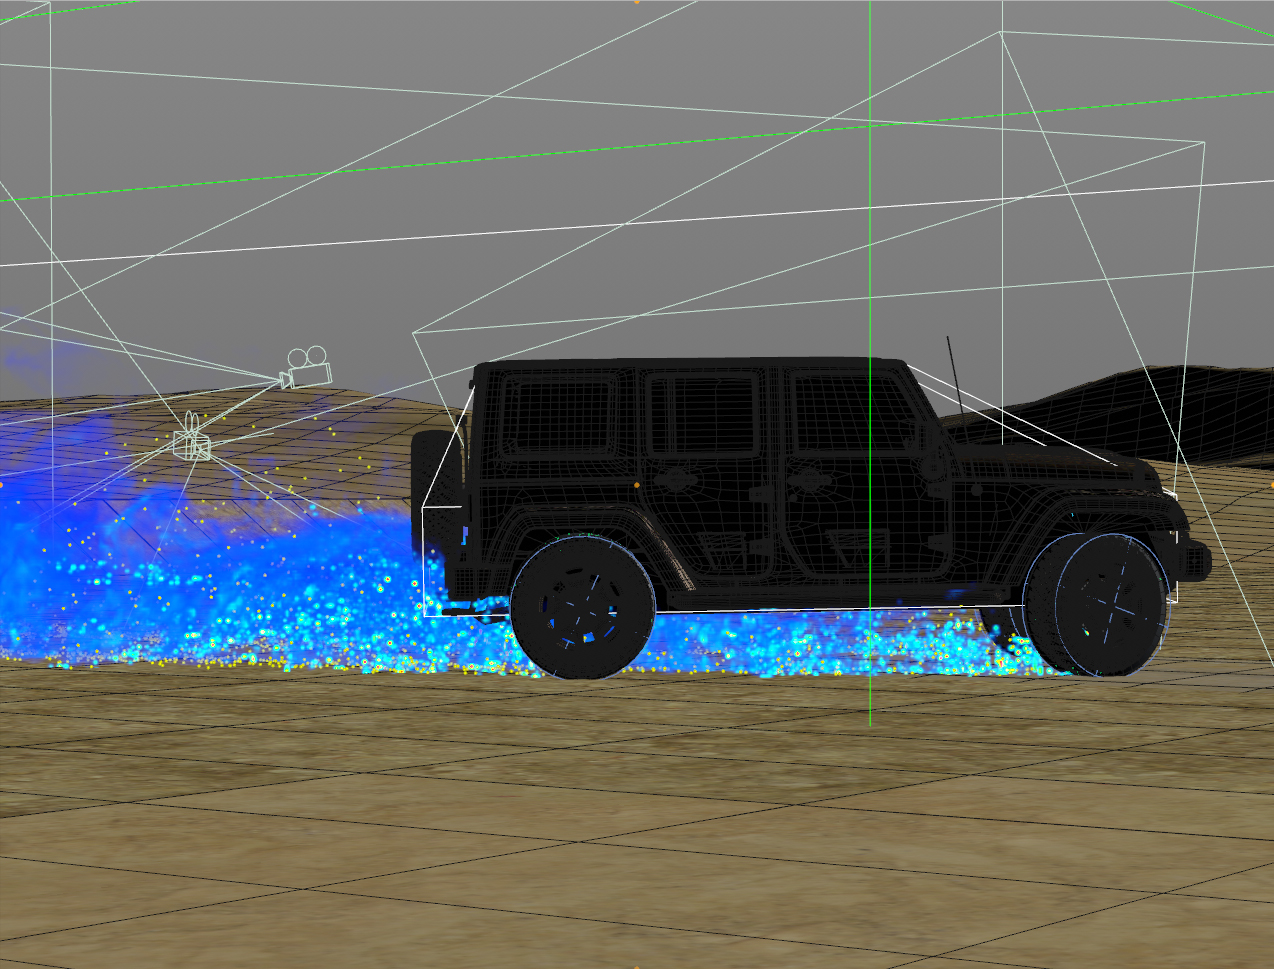 jeep_drive_H_04_0176_wire.jpg